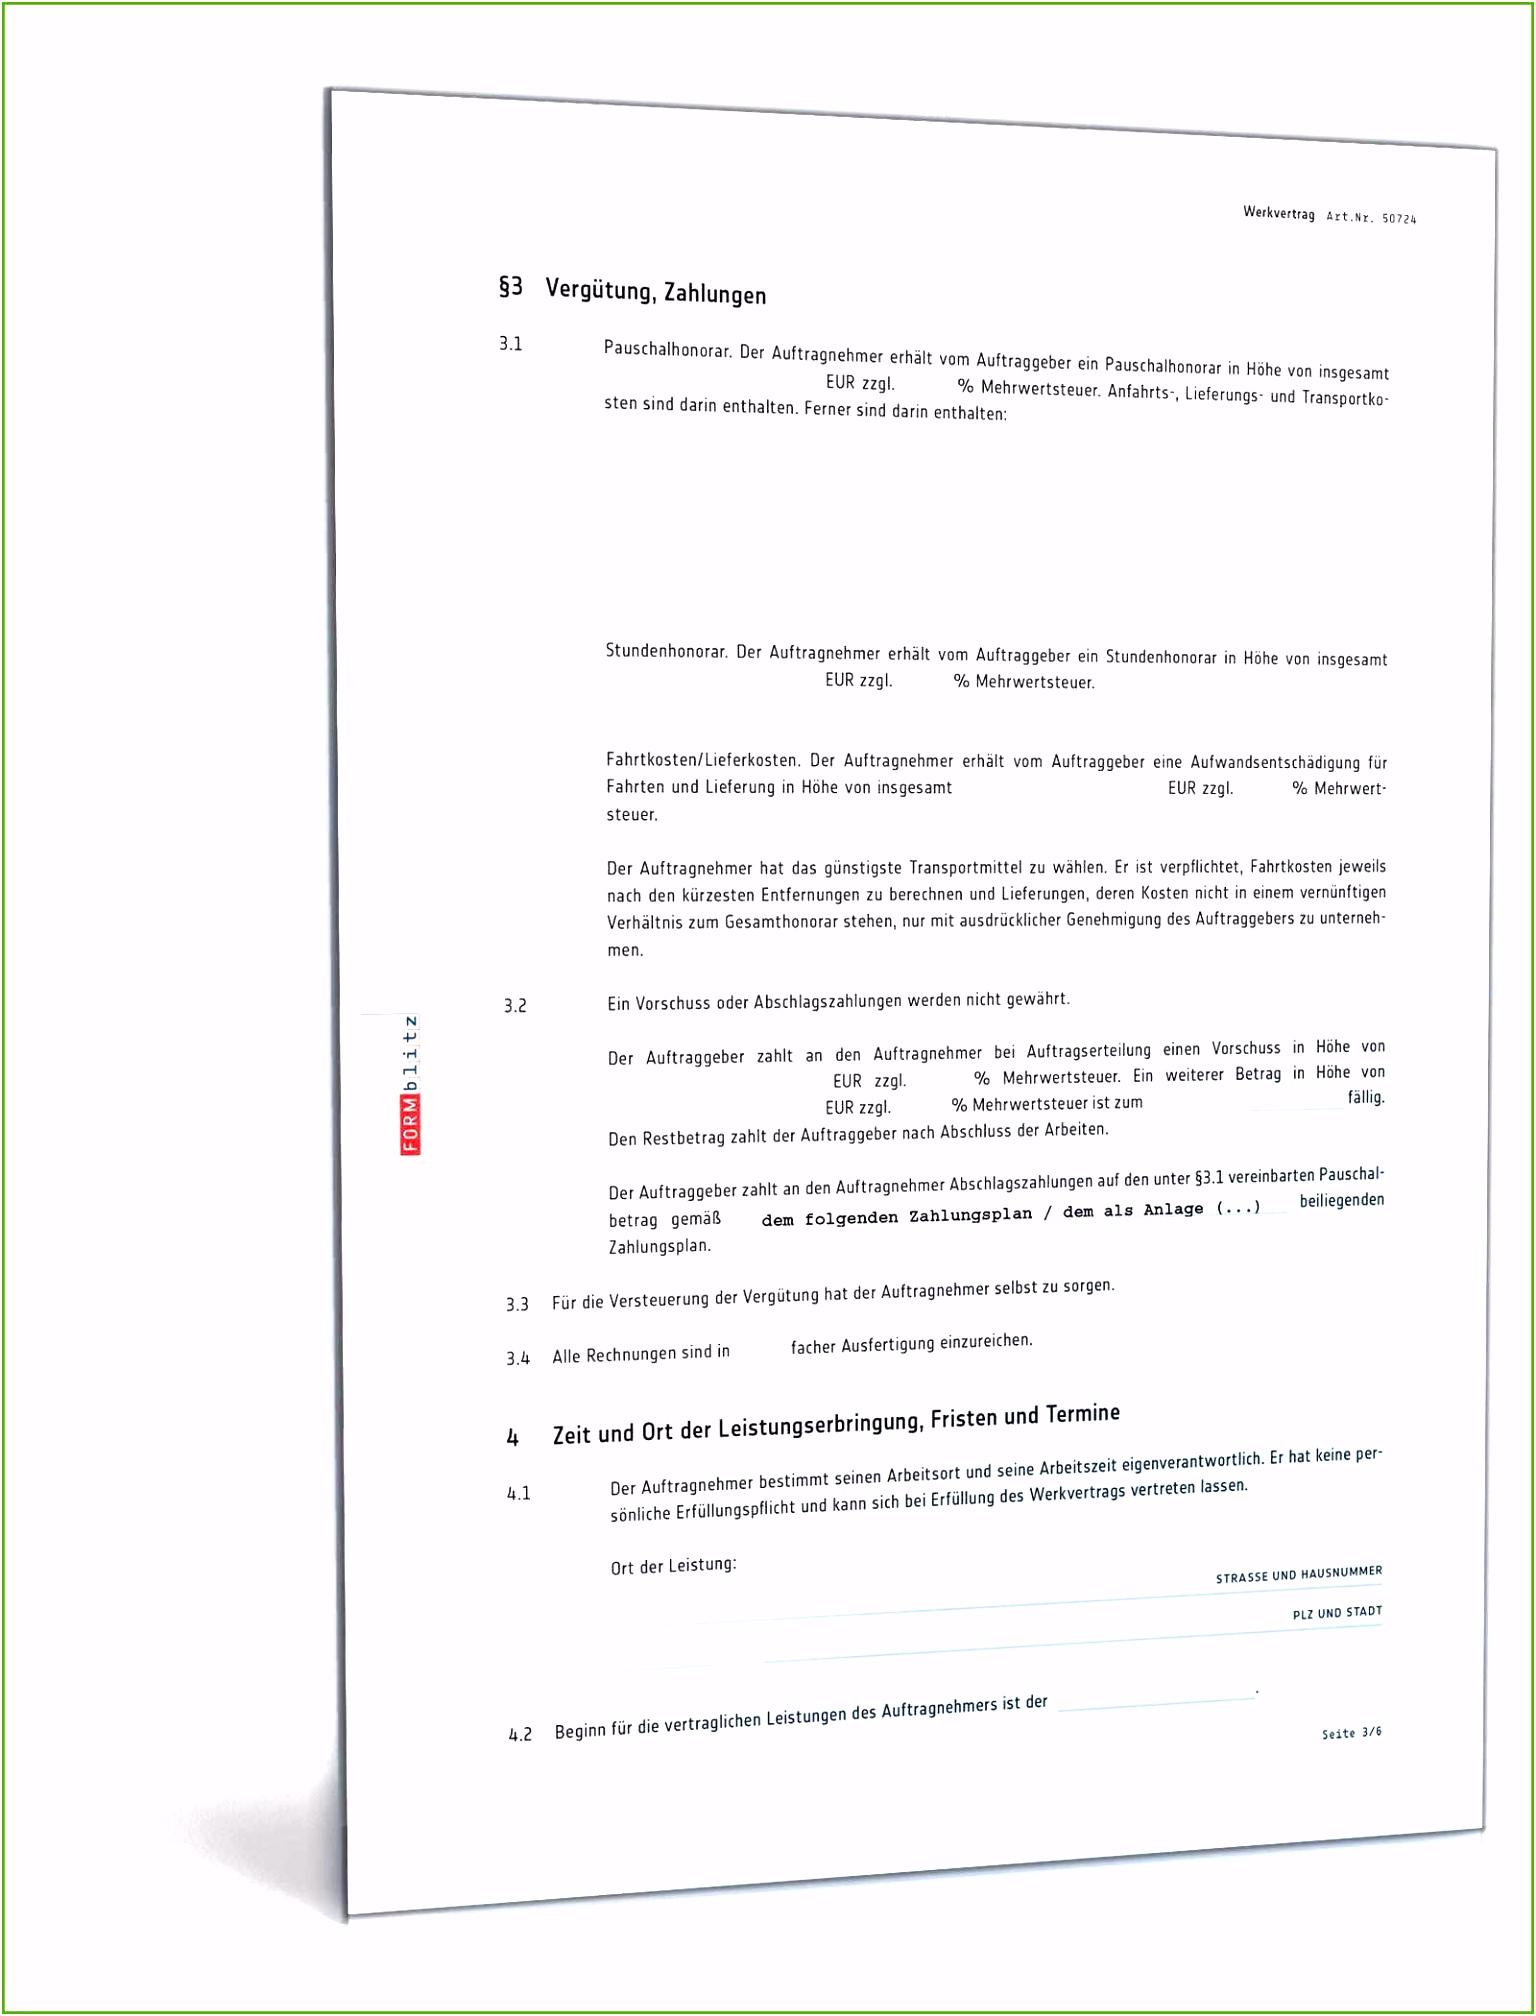 Werkvertrag Vorlage 16 Vision 2019